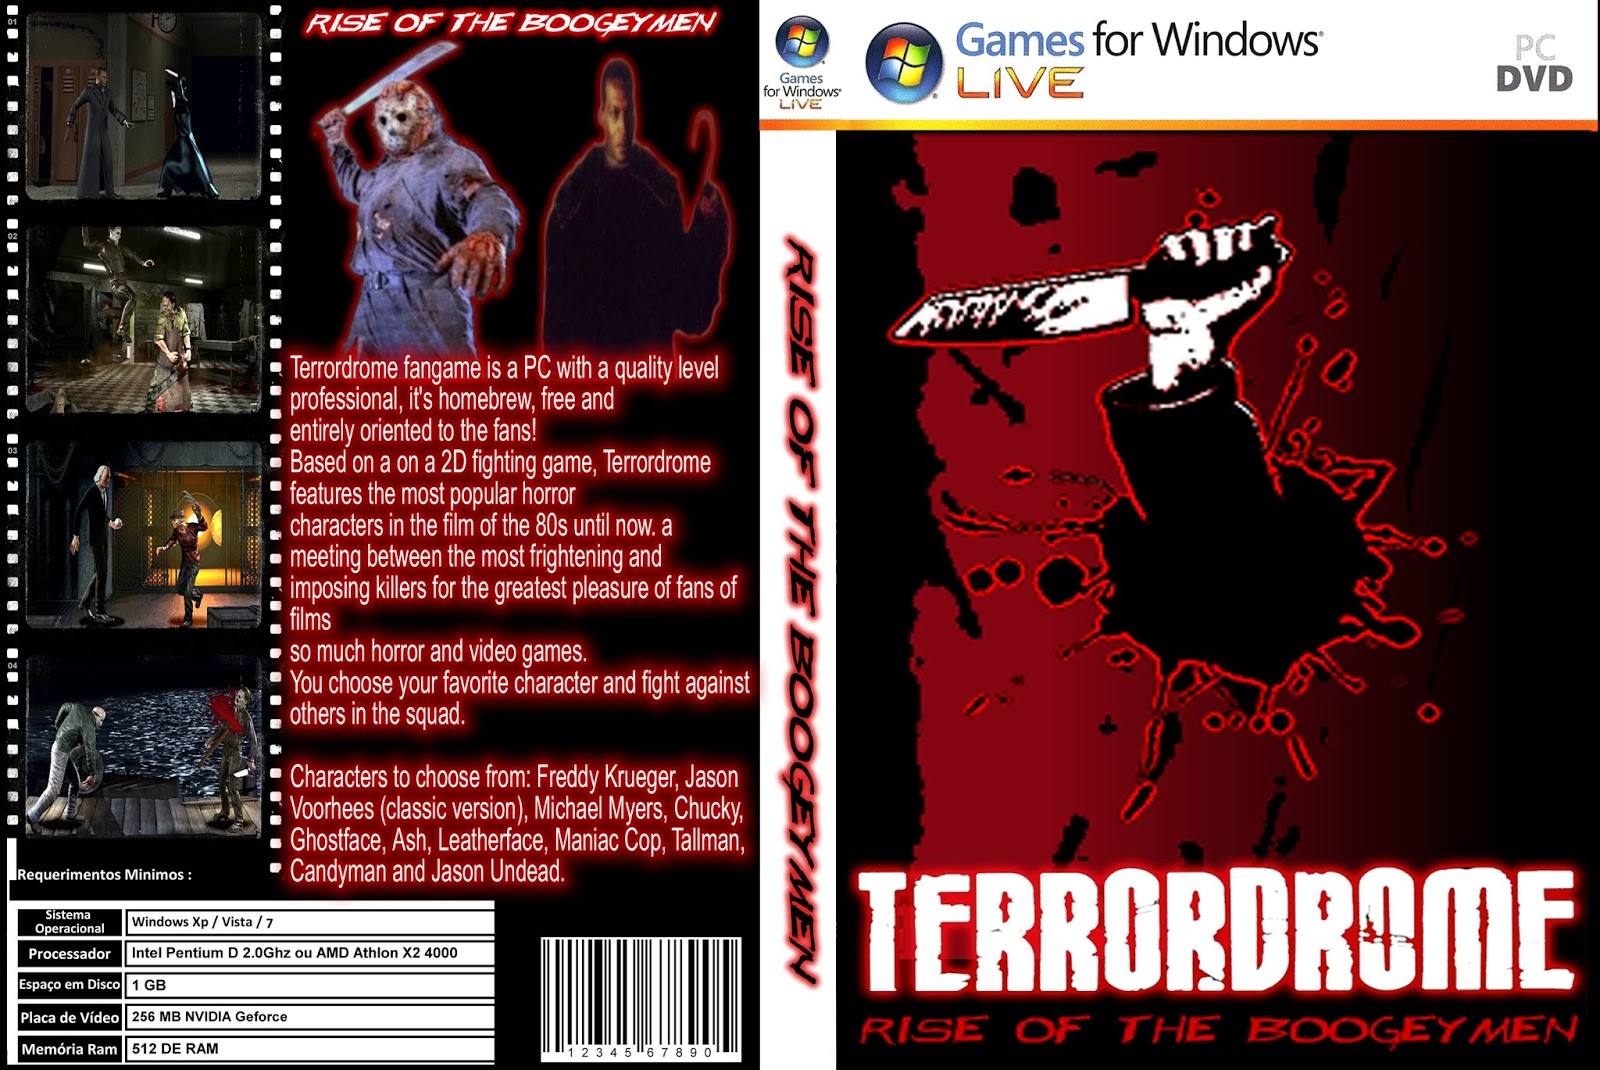 BAIXAR TERRORDROME PC